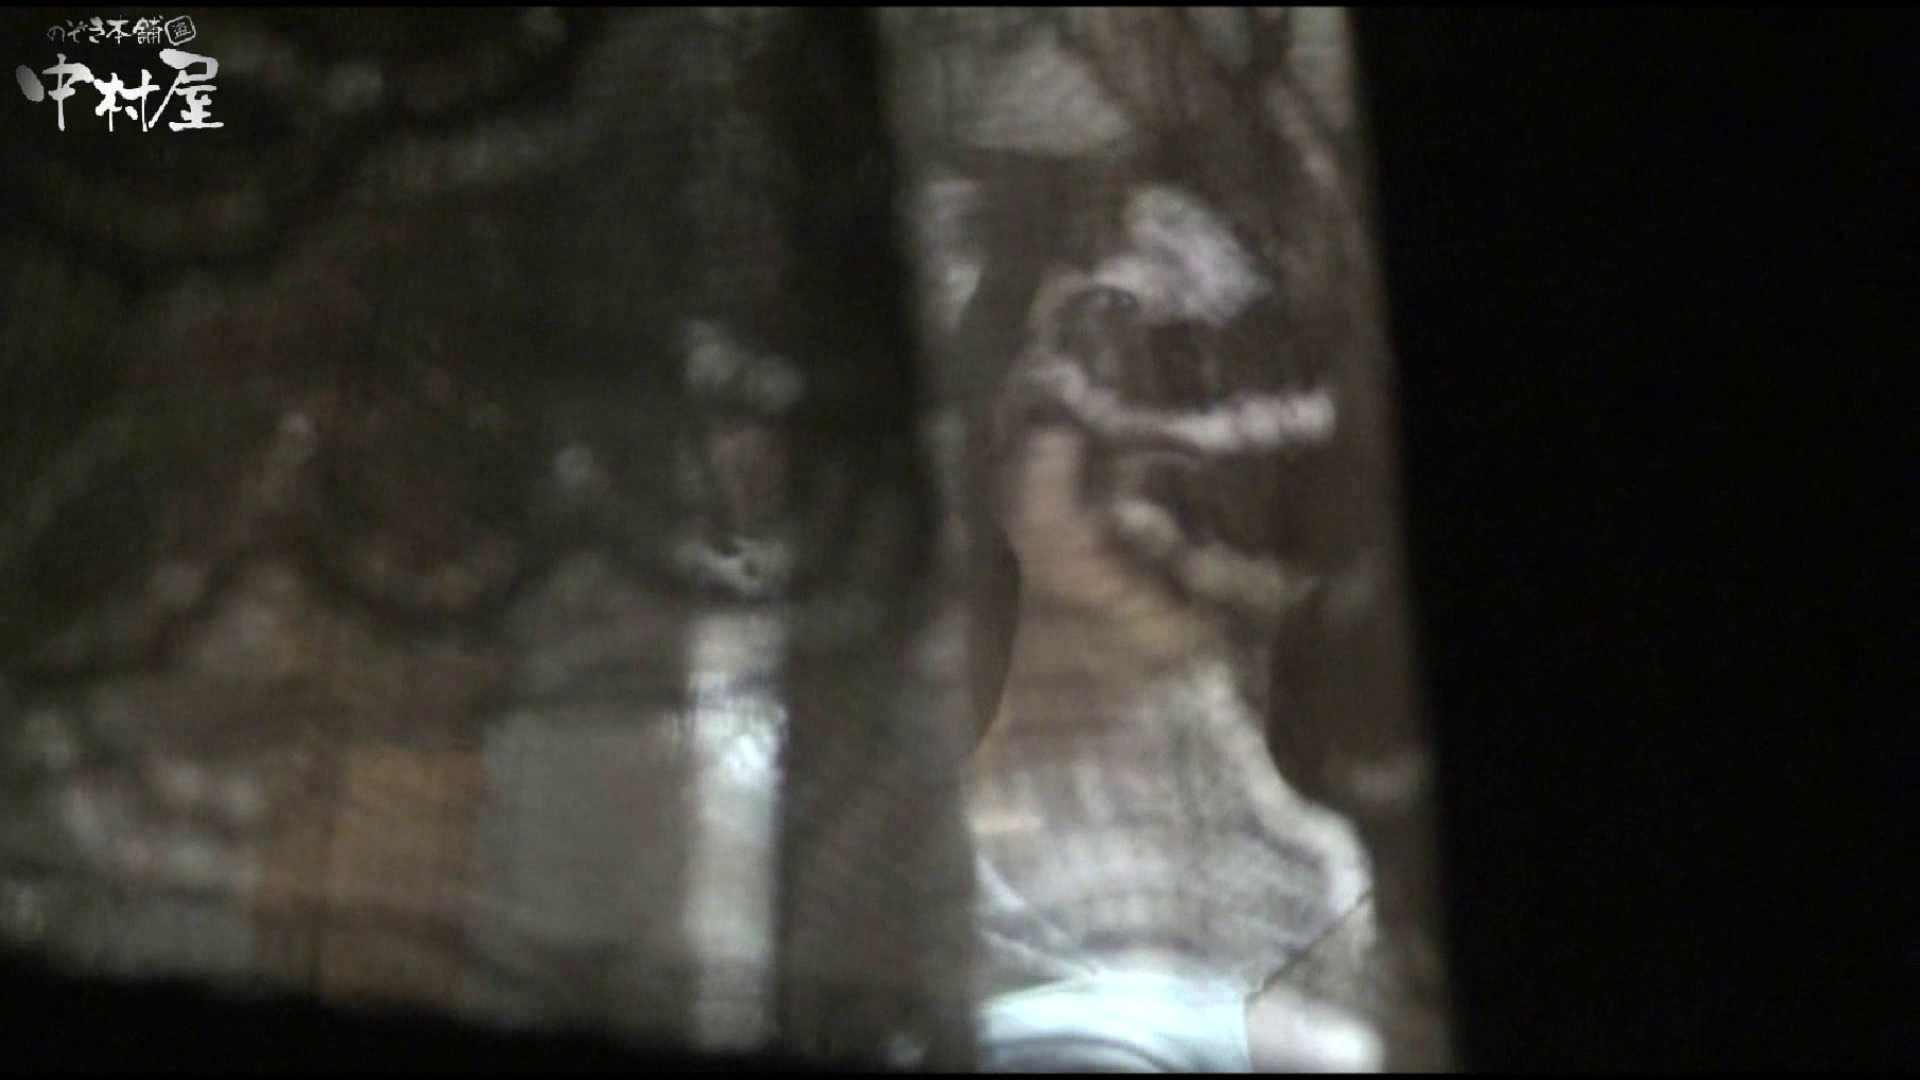 民家風呂専門盗撮師の超危険映像 vol.028 OLハメ撮り  28Pix 5